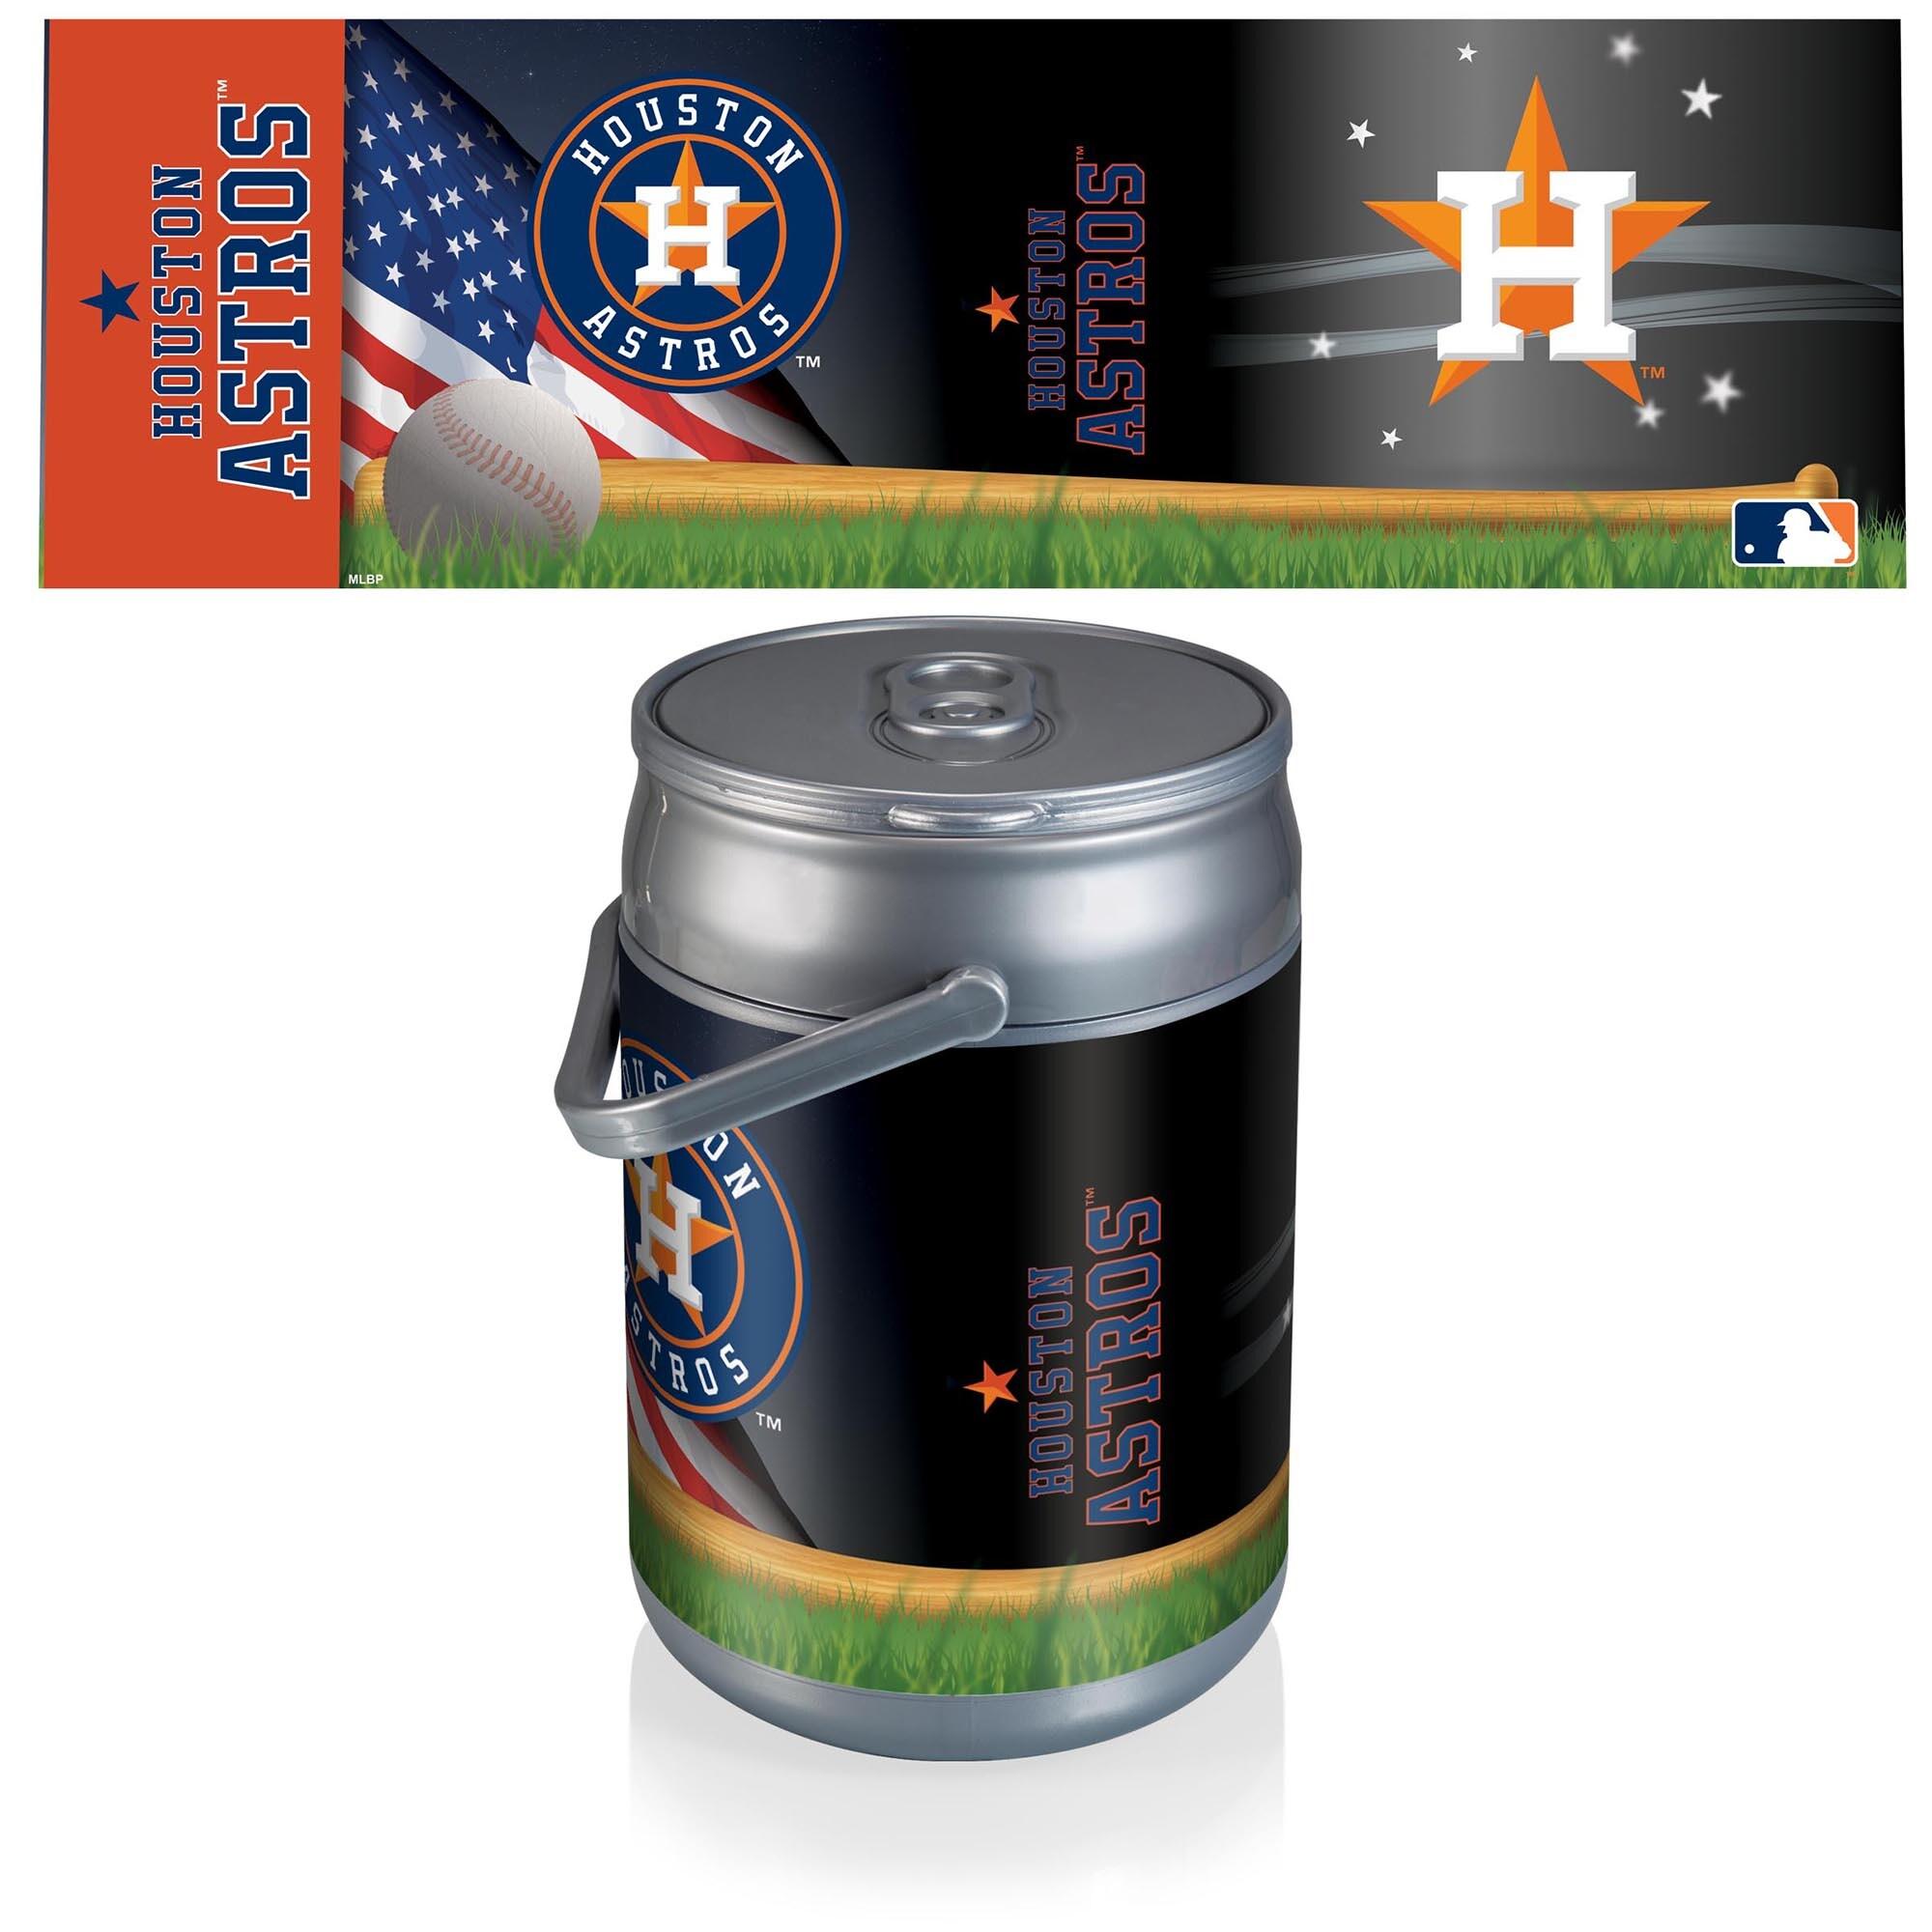 Houston Astros Baseball Can Cooler